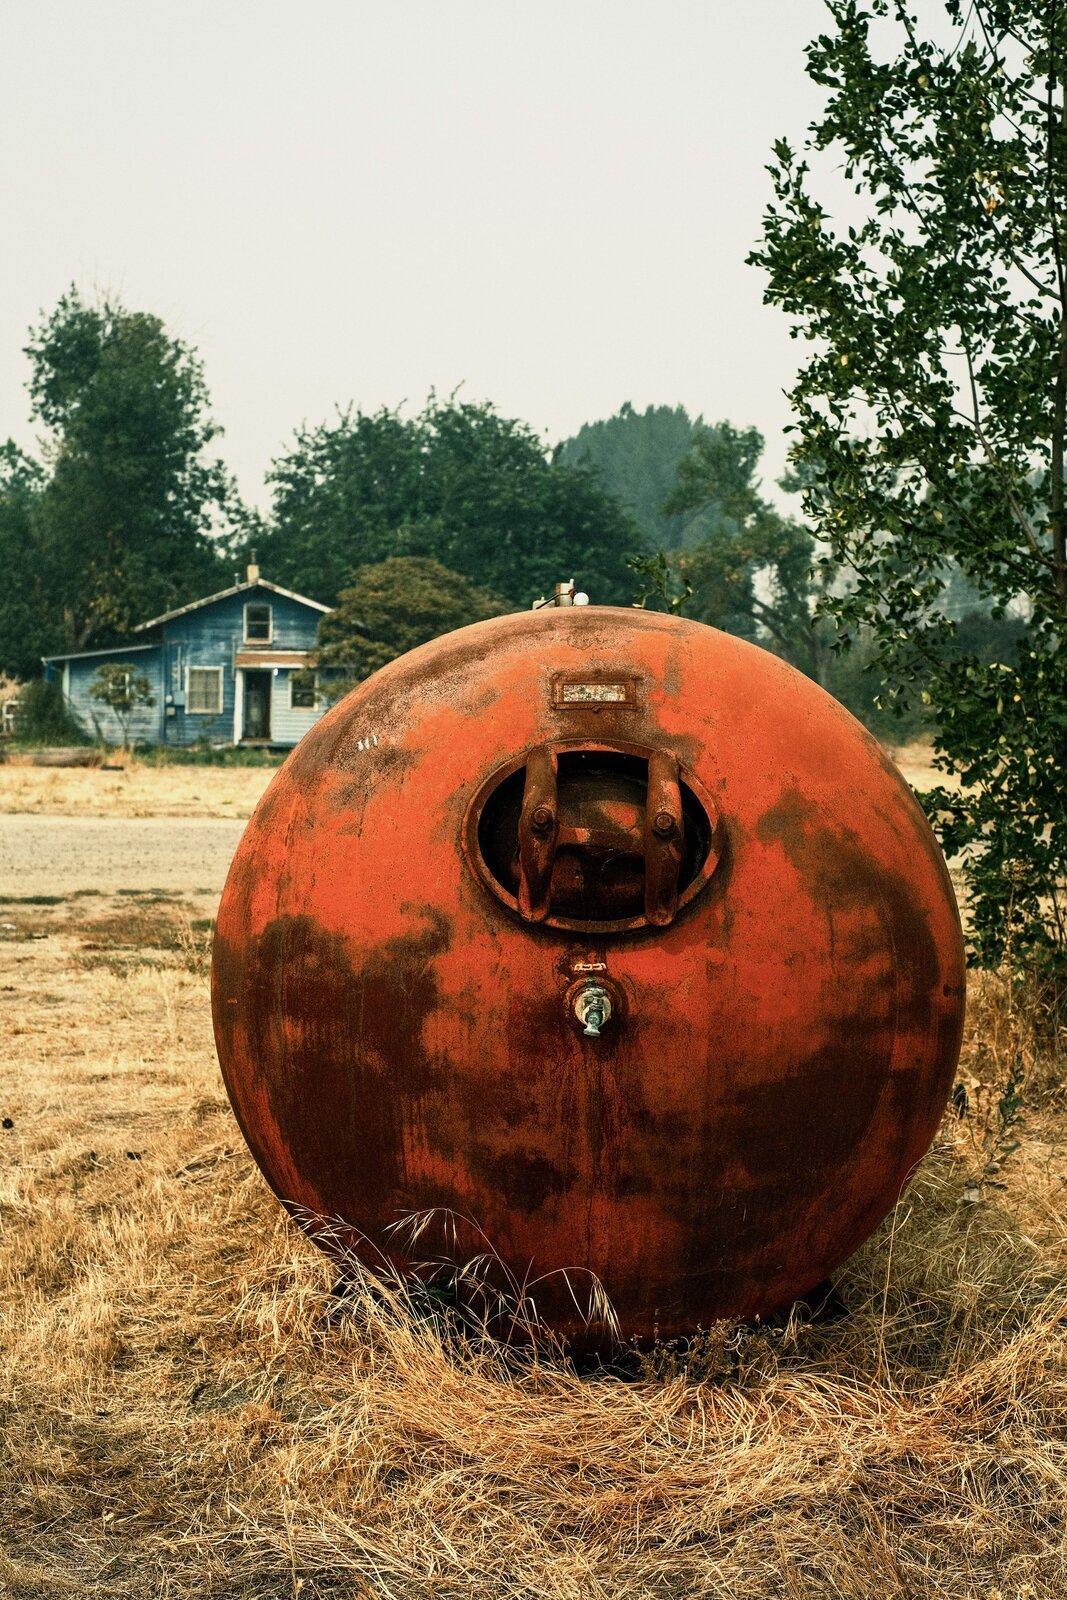 XPro3_Sept5_21_old_propane_tank.jpg